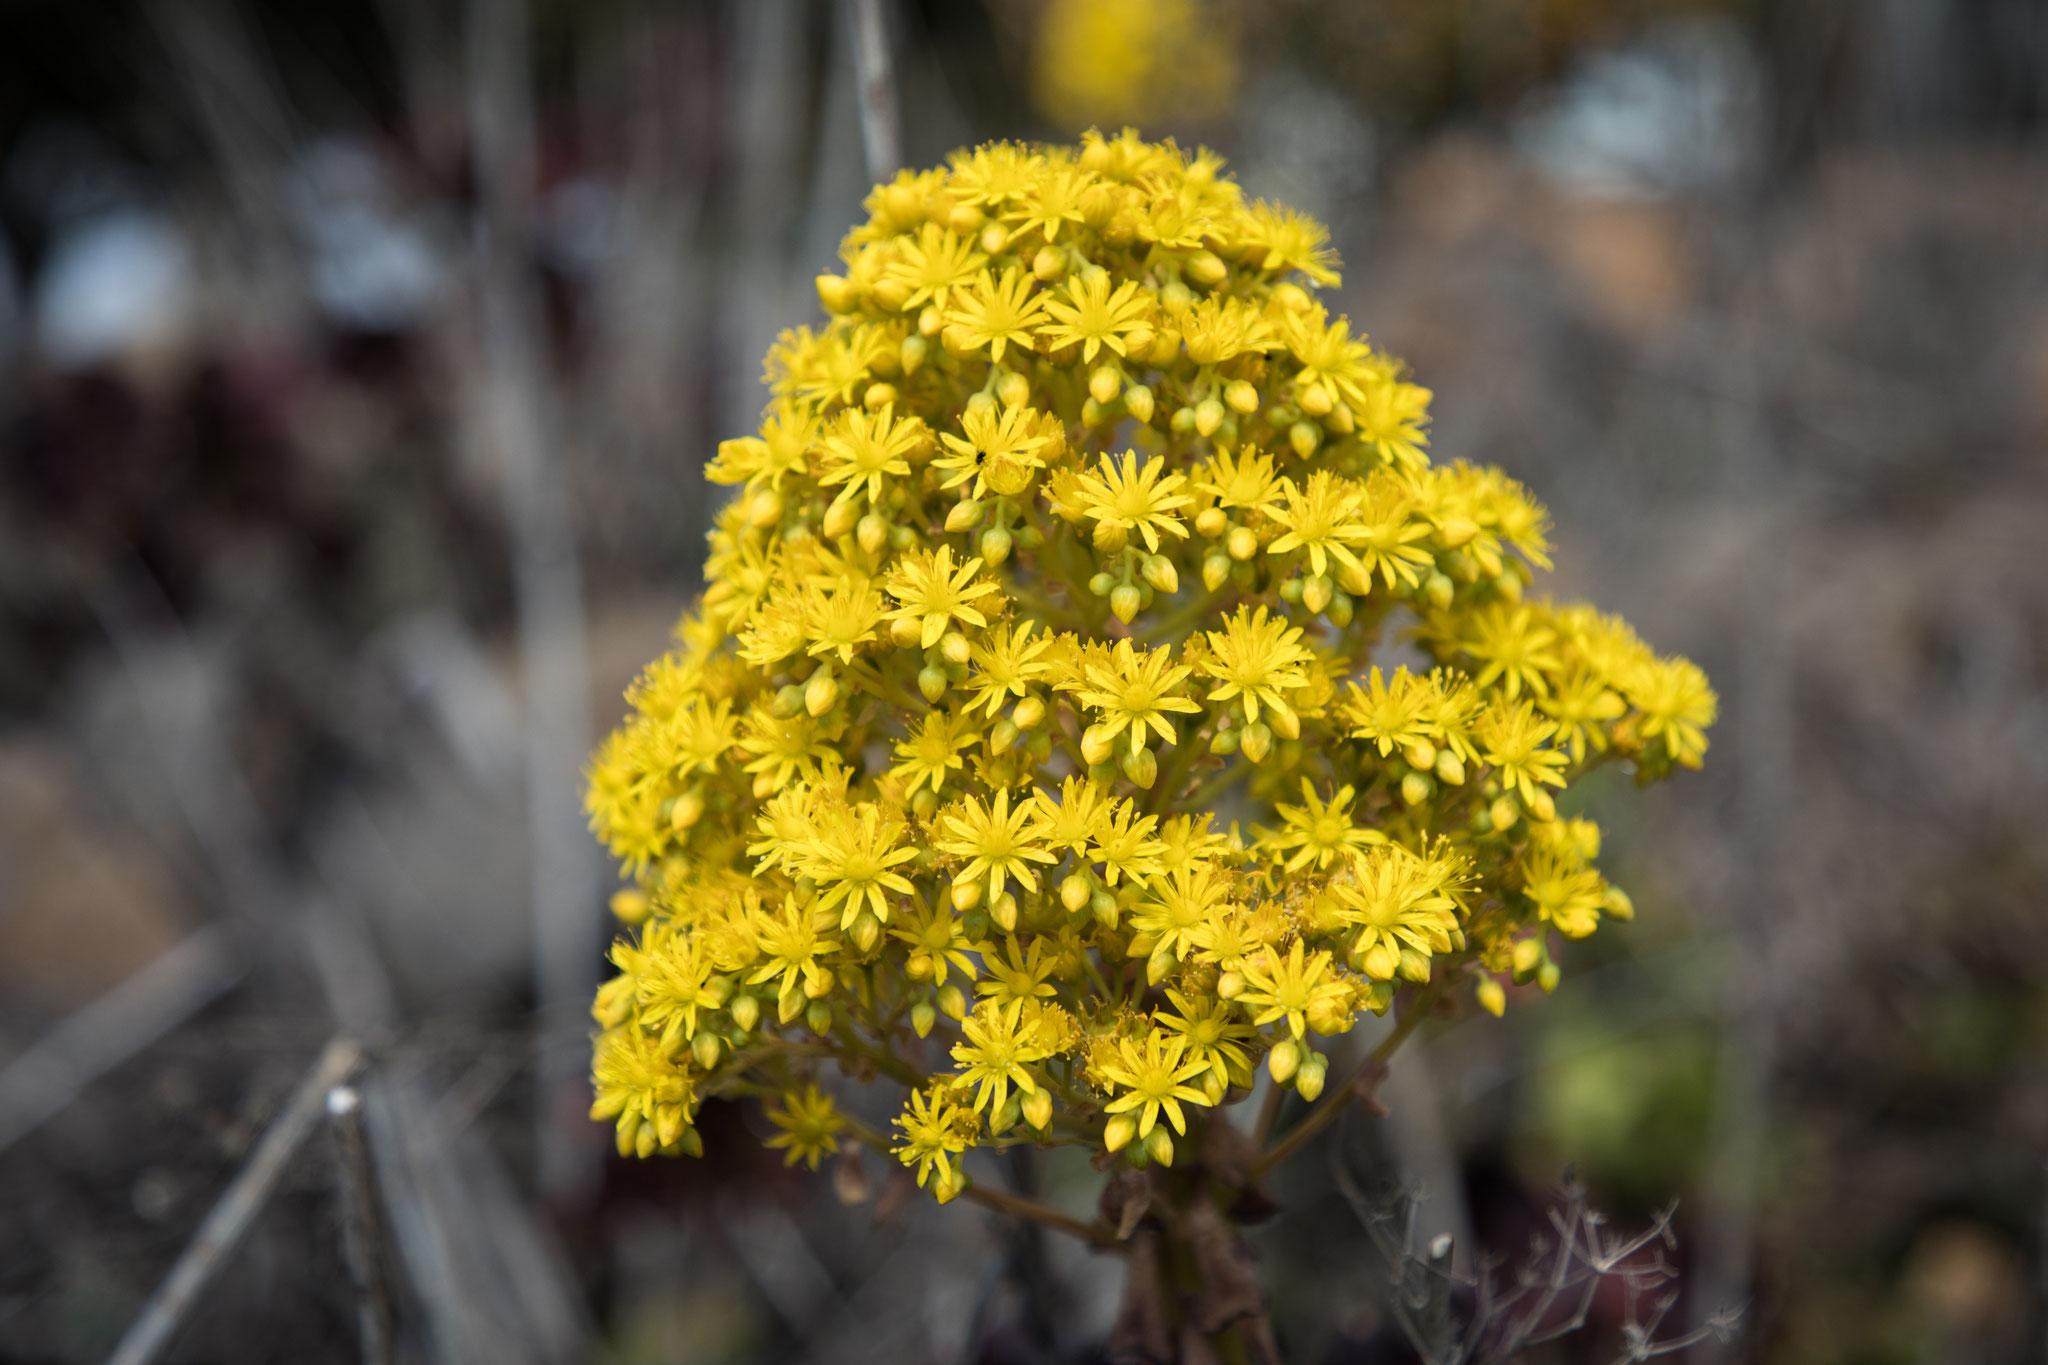 Aeoniumblüte